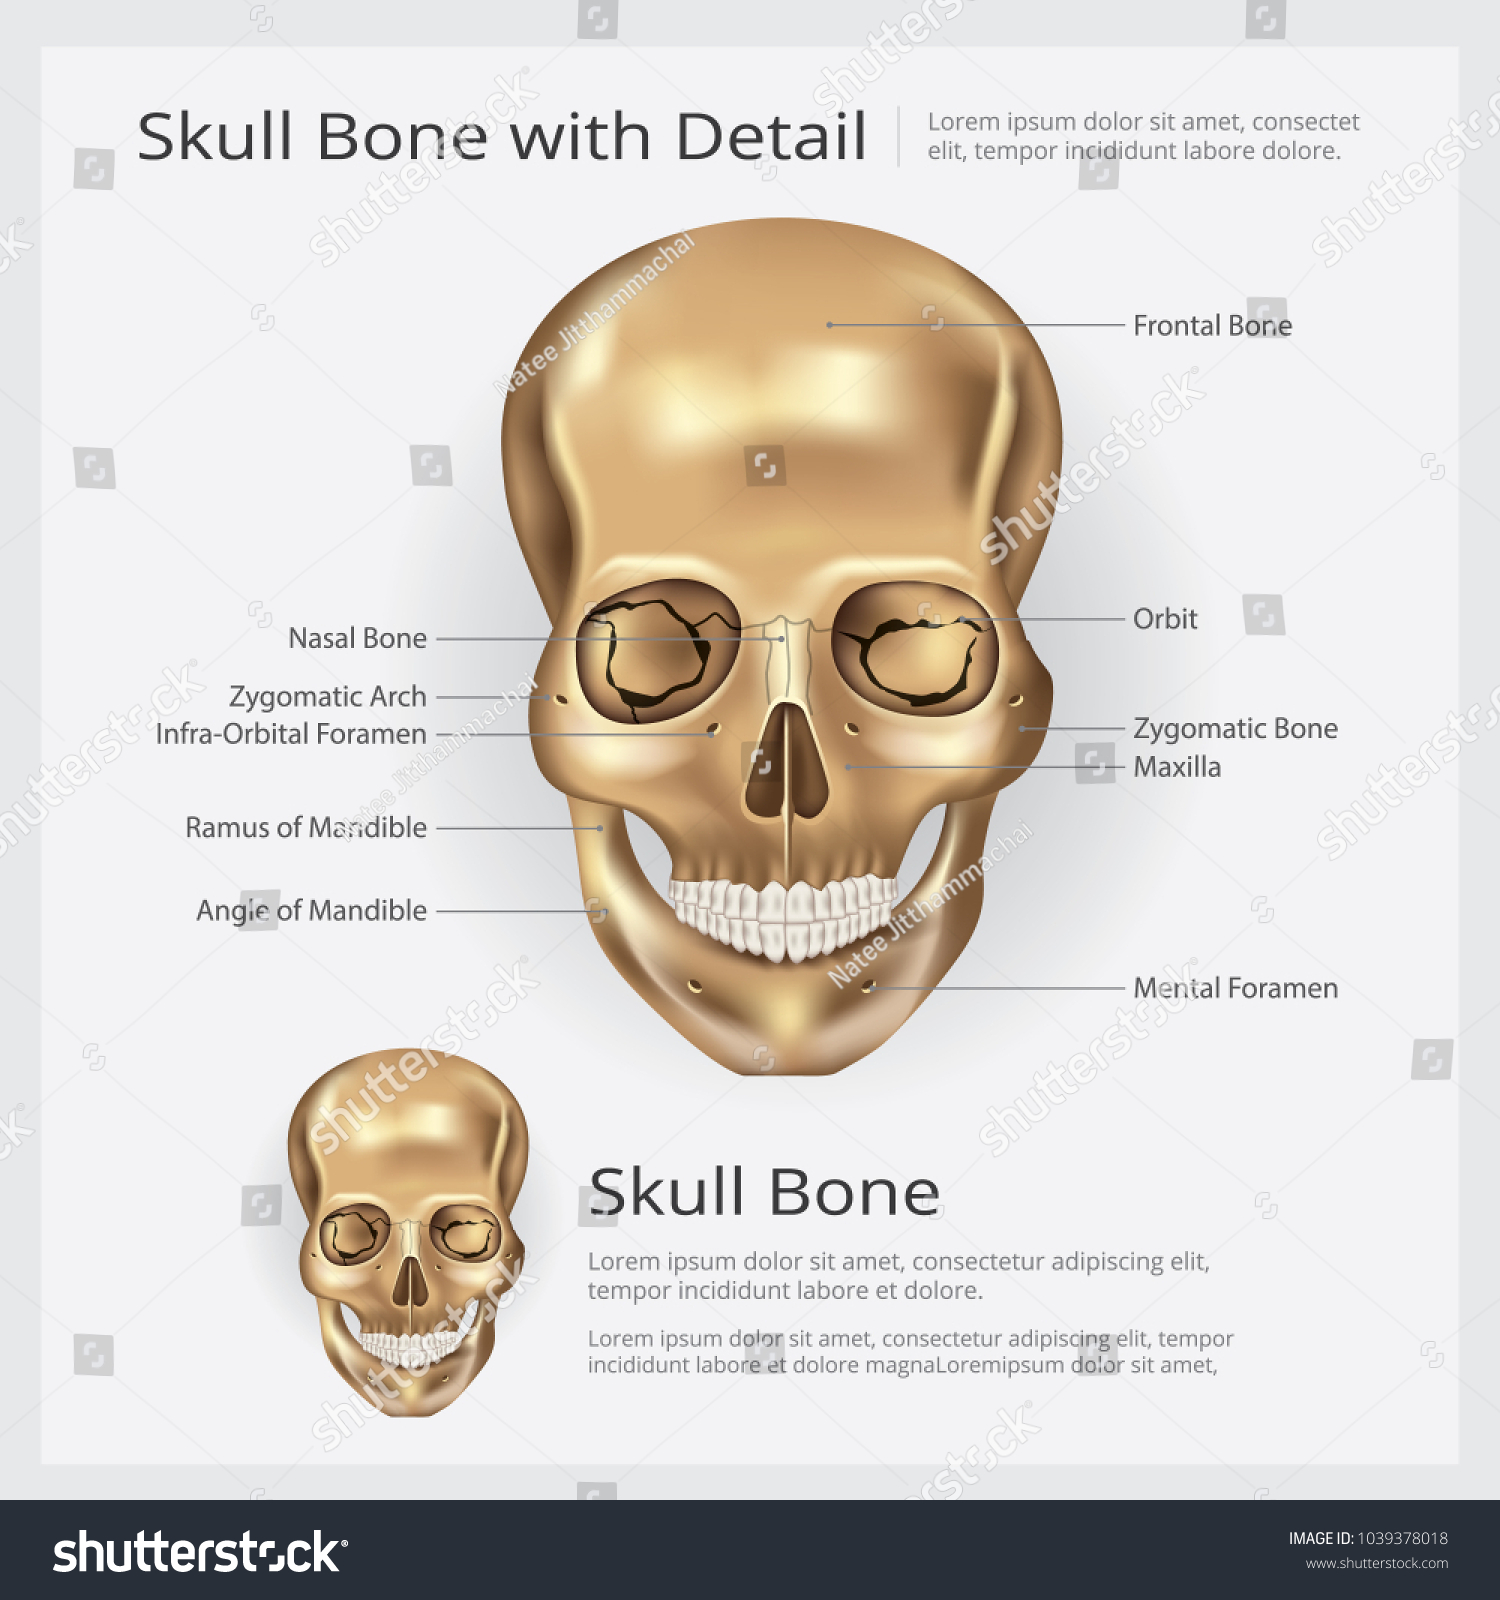 Human Bone Skull Anatomy Vector Illustration Stock Vector (Royalty ...